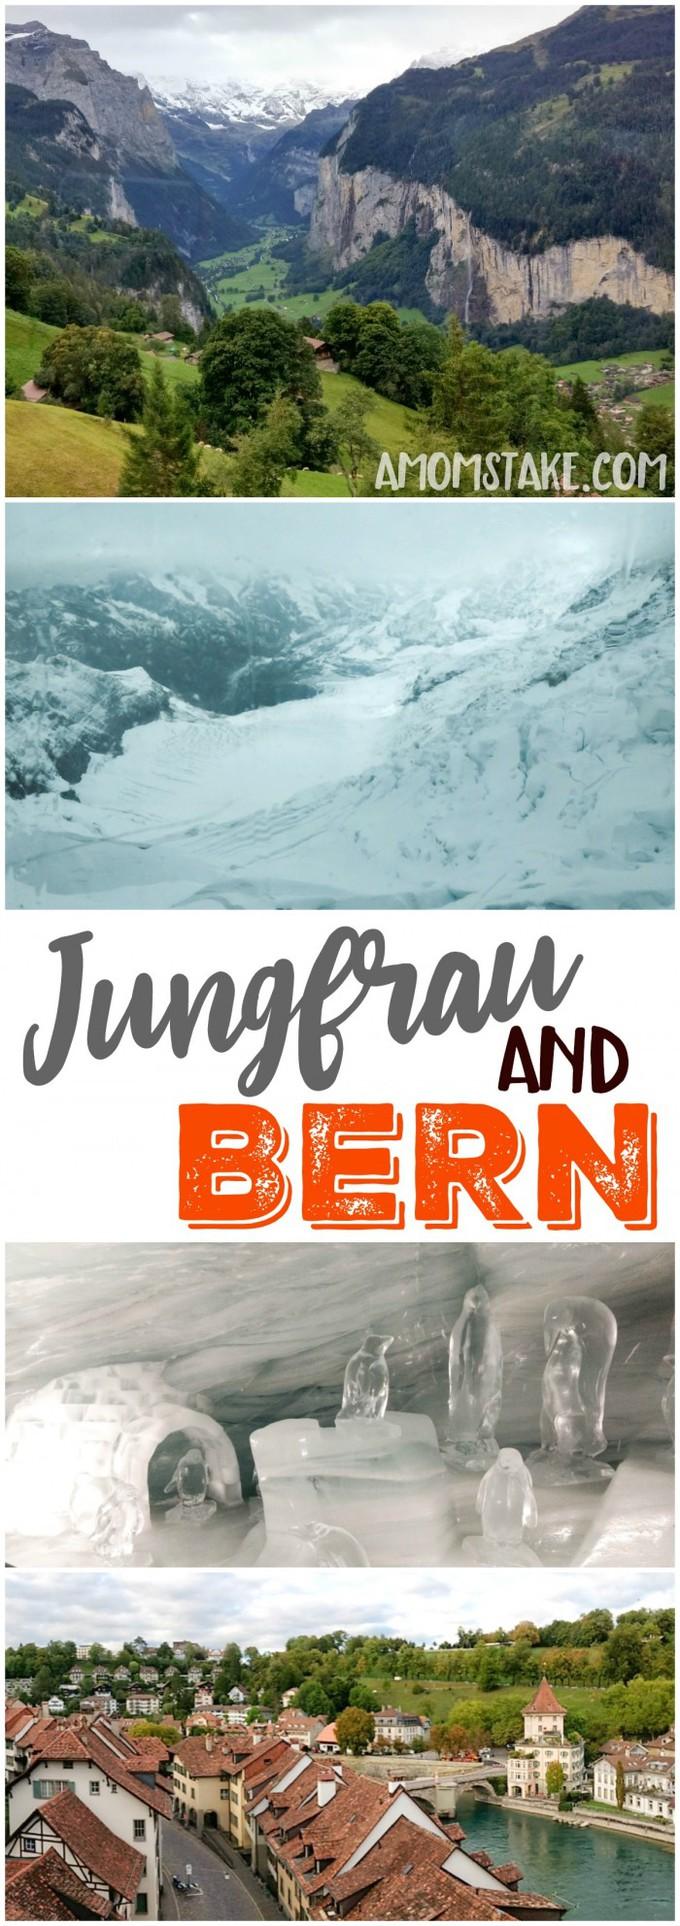 Western Europe Road trip day 4 takes us to Jungfrau